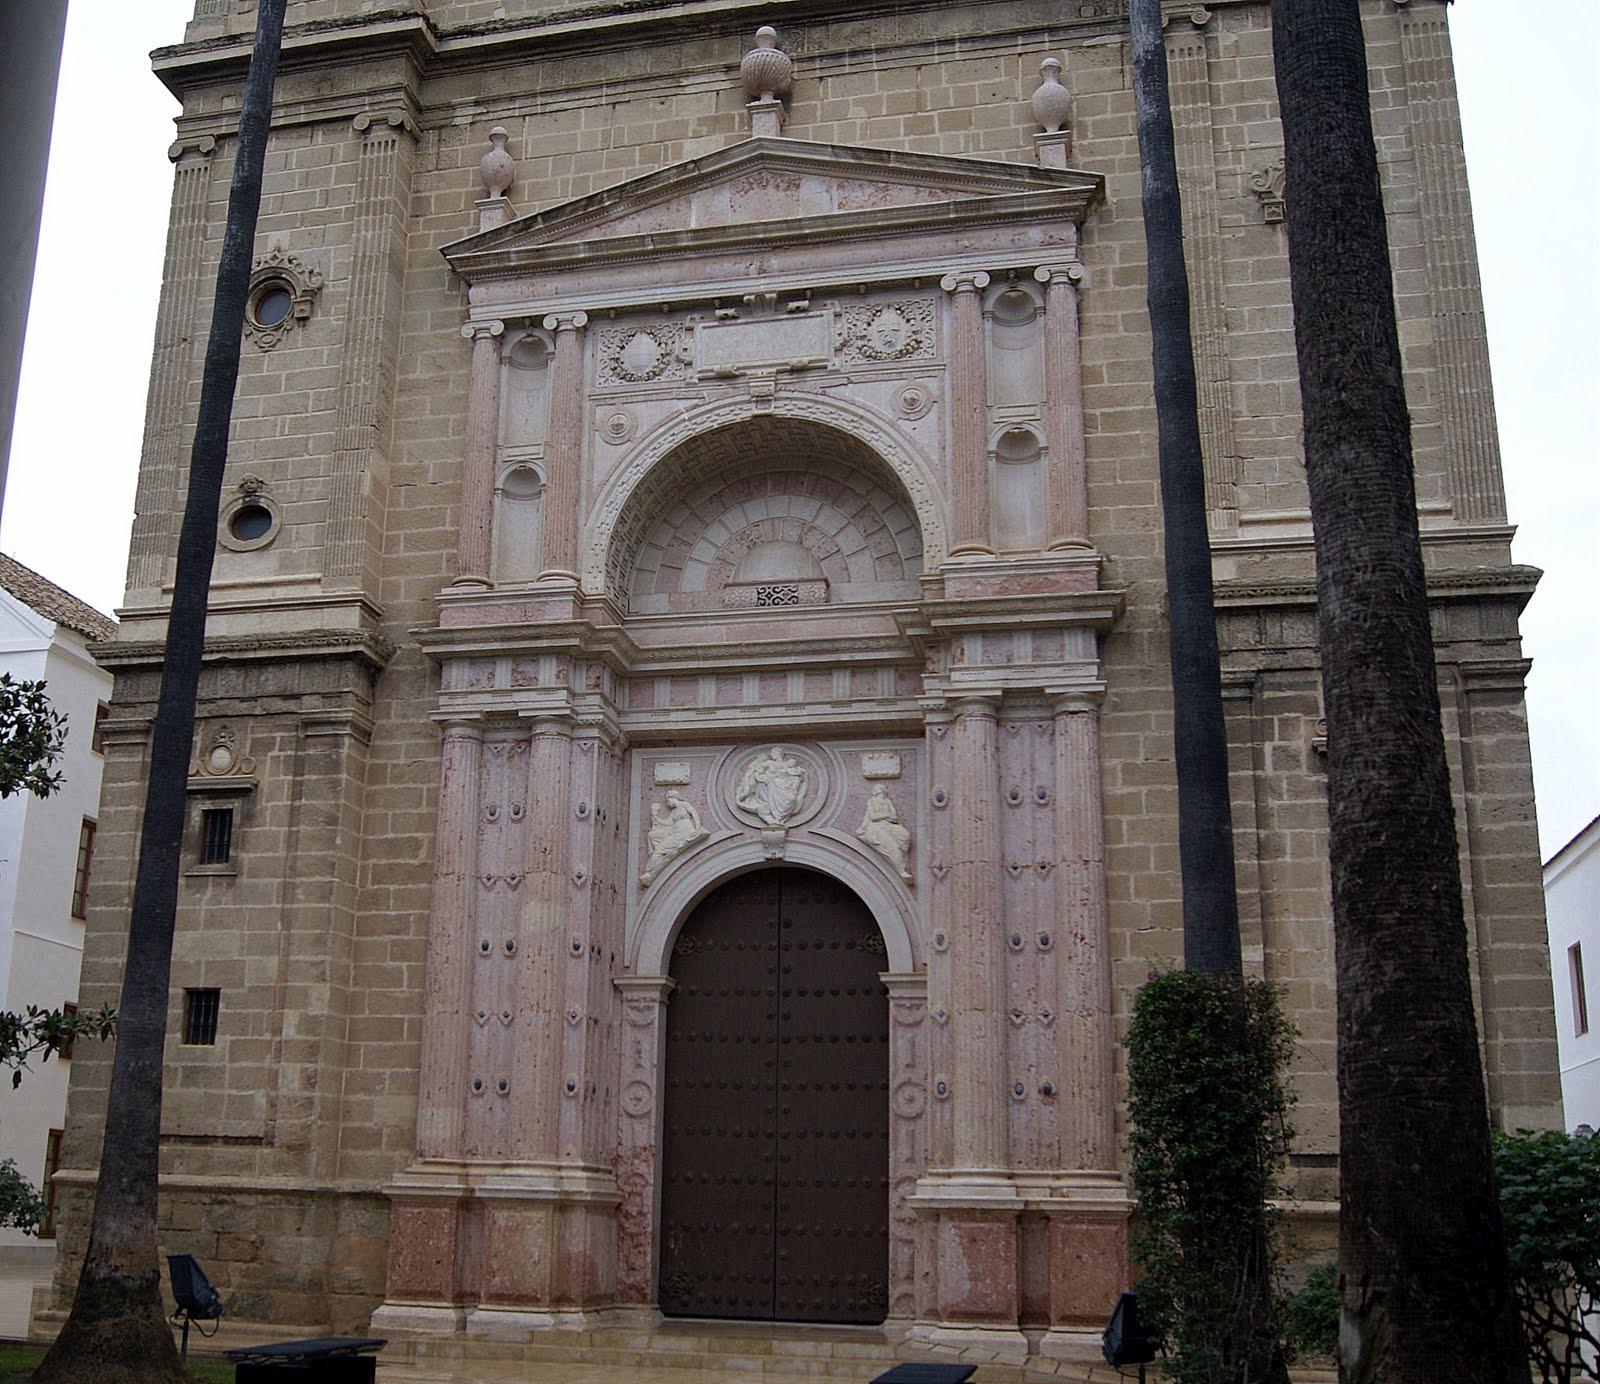 Puerta de la iglesia central